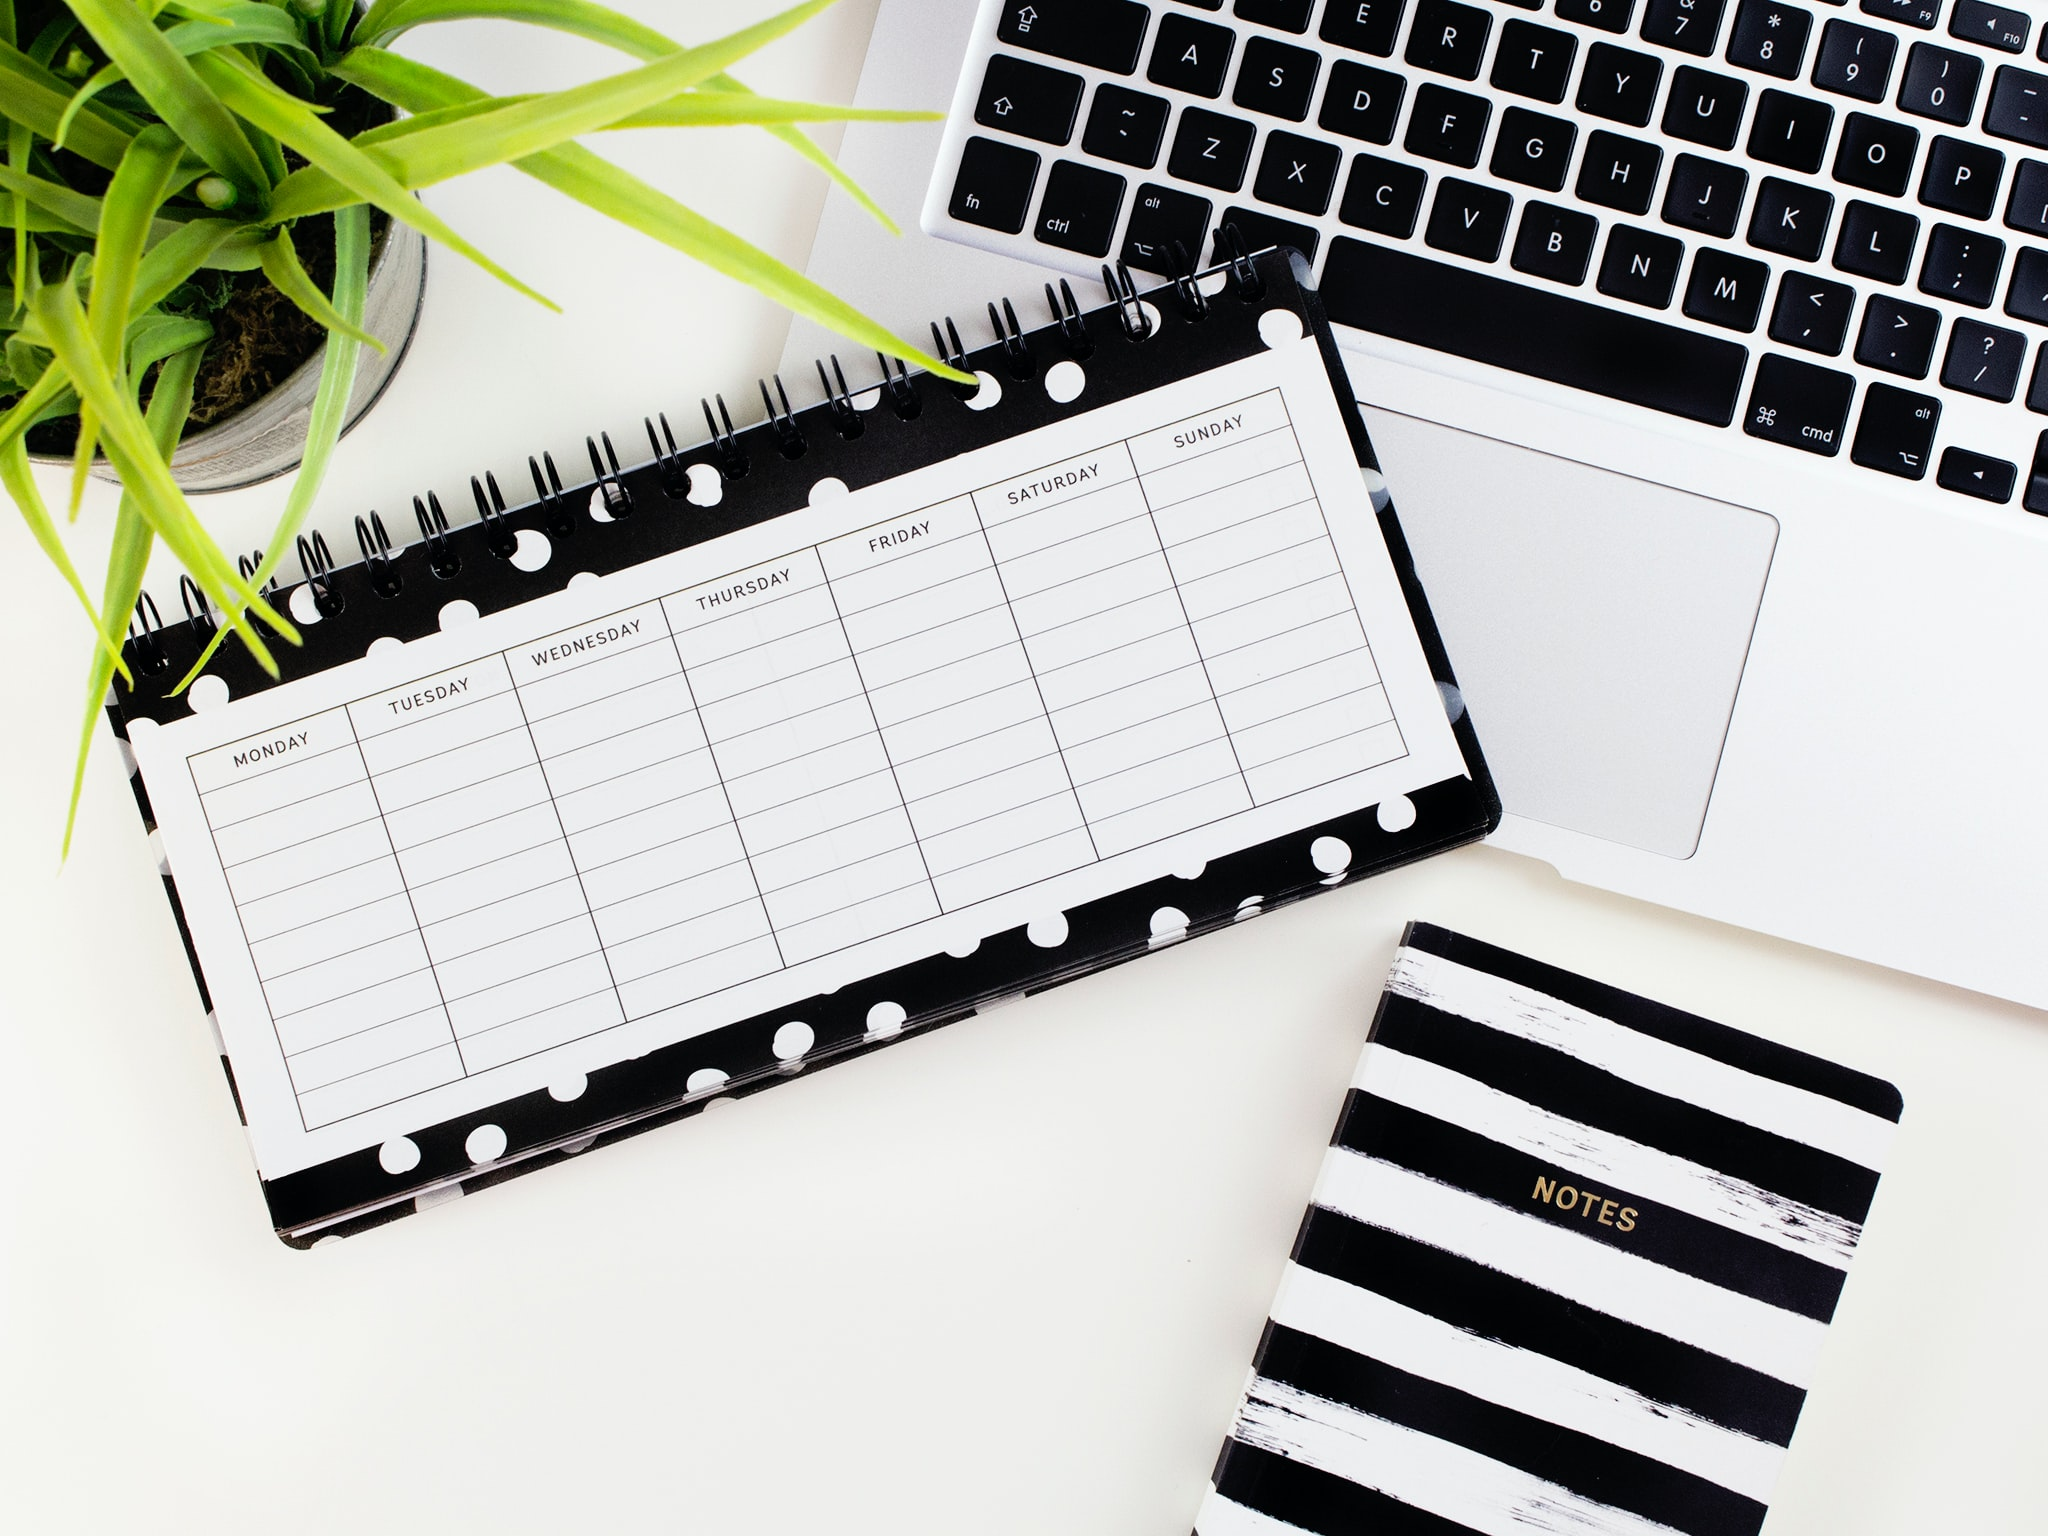 desk calendar and computer